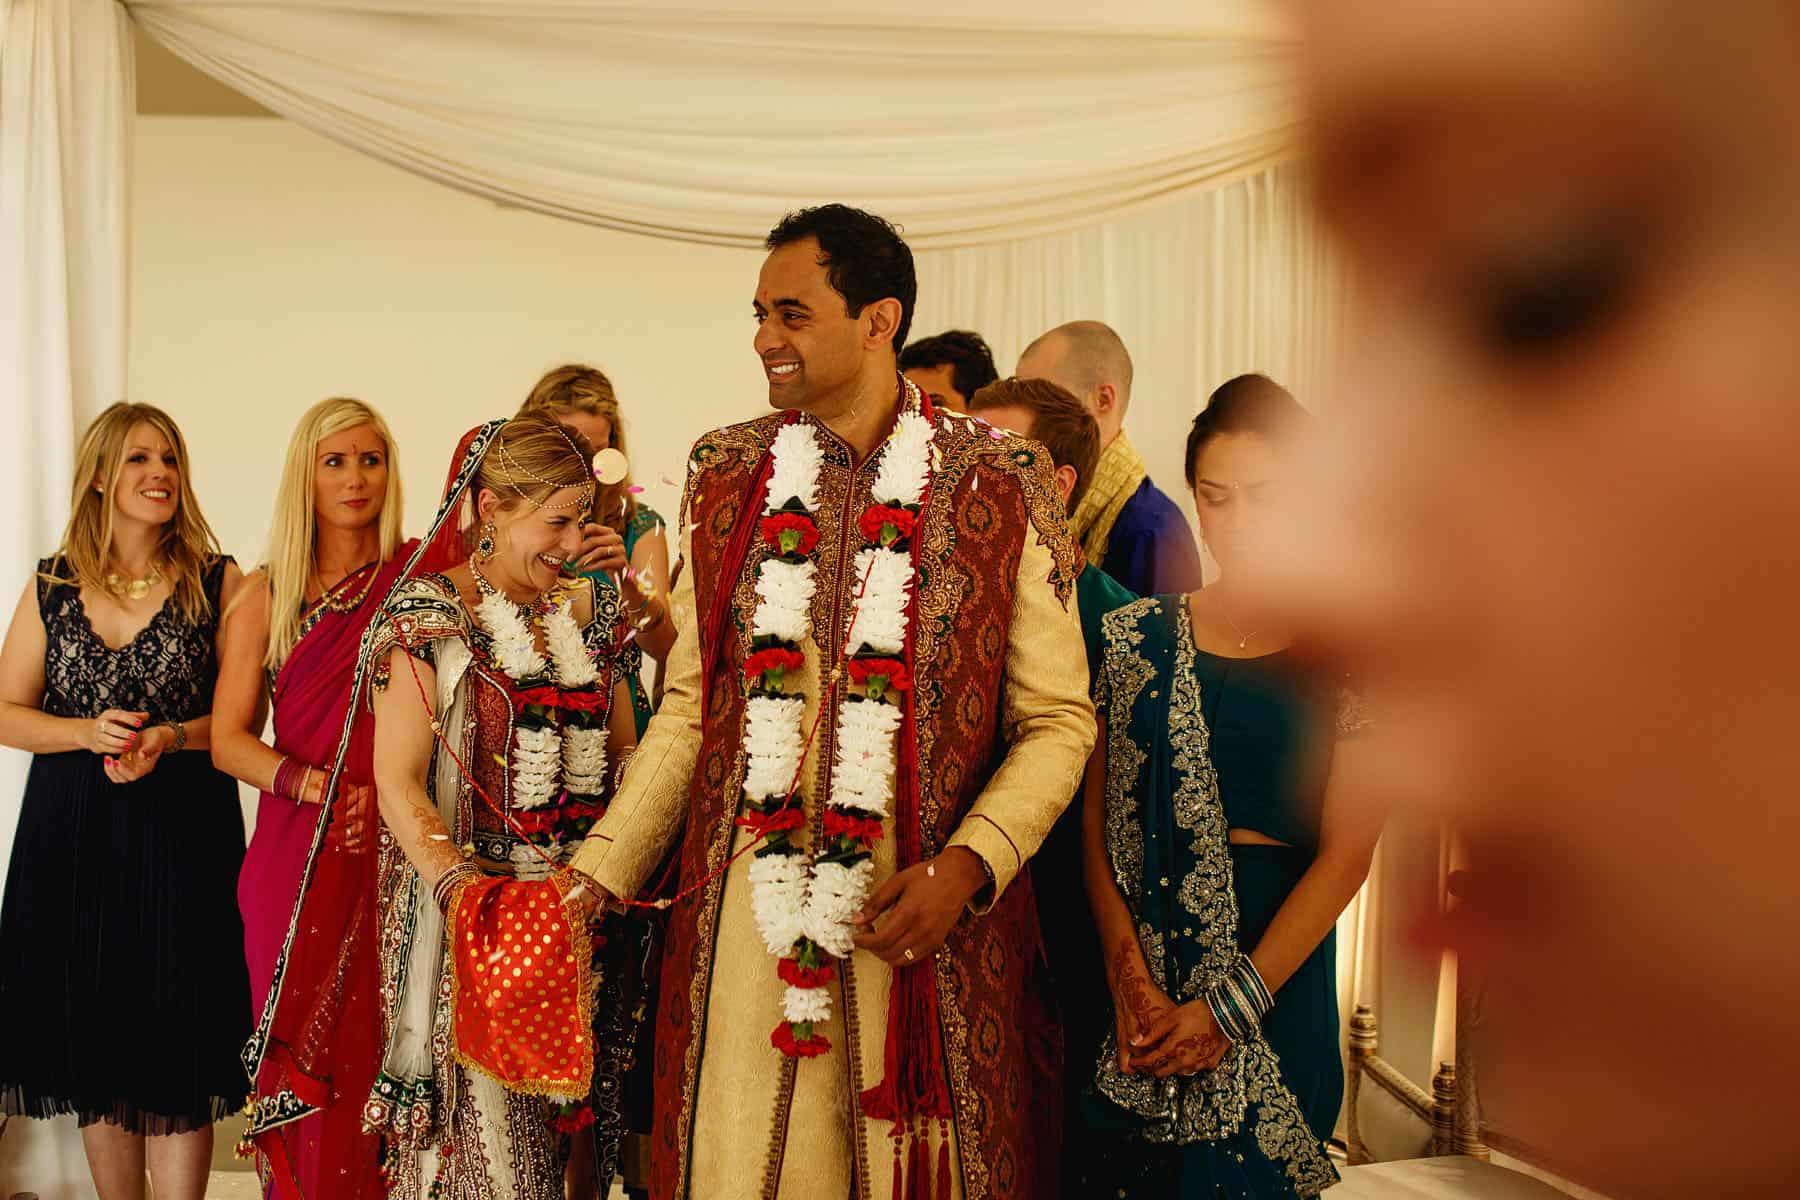 ladywood estate hindu wedding